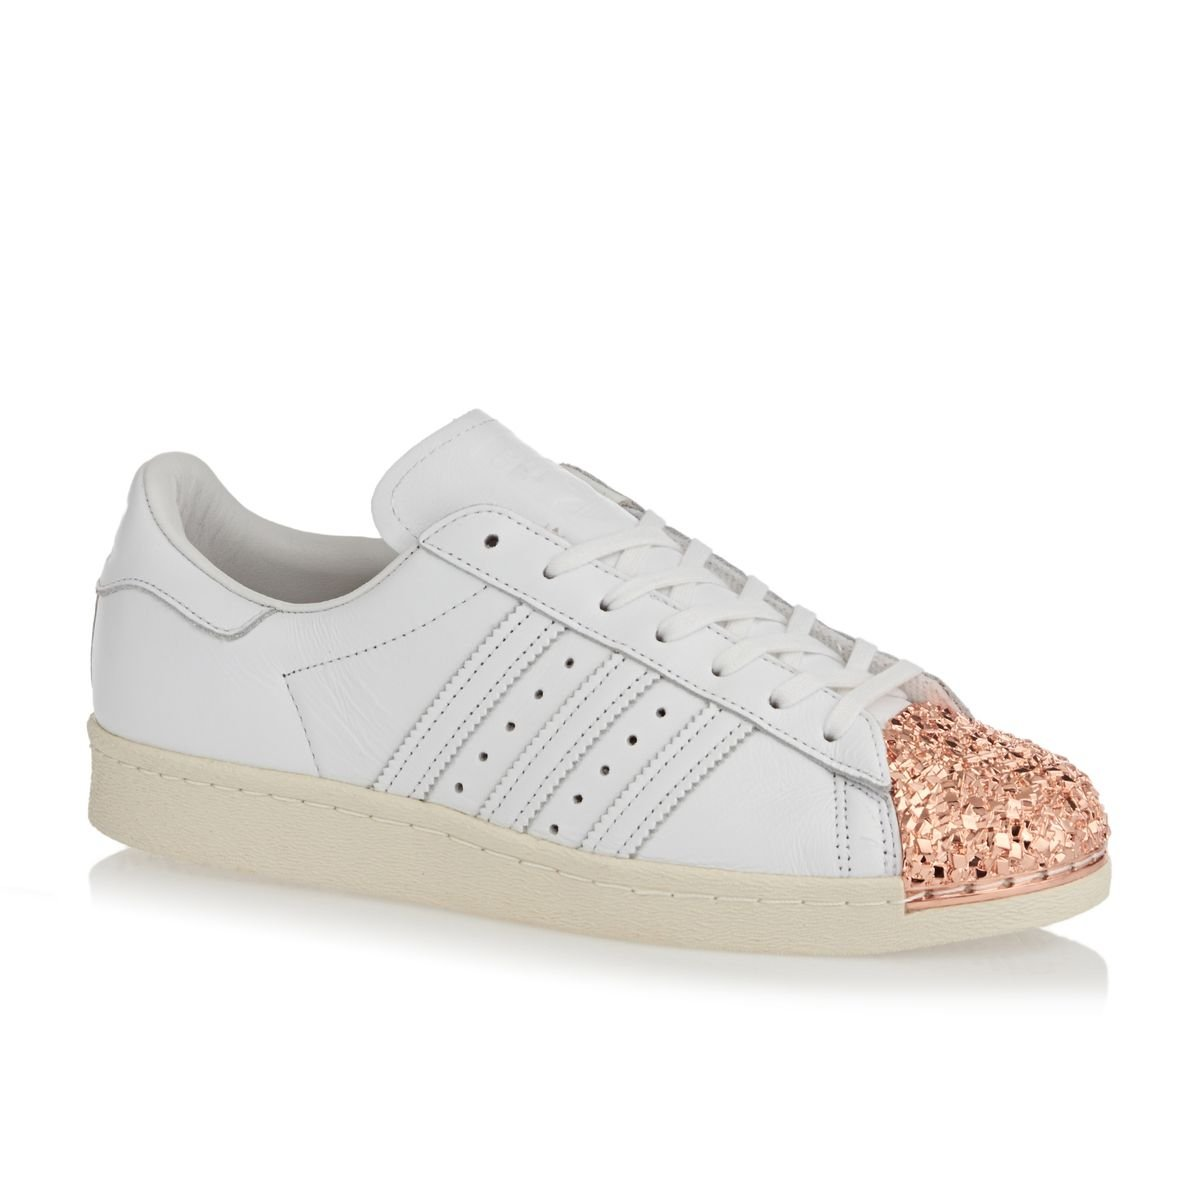 Adidas Turnschuhe damen Superstar 80S 3D MT W BB2034 Weiß Schuhgröße 38